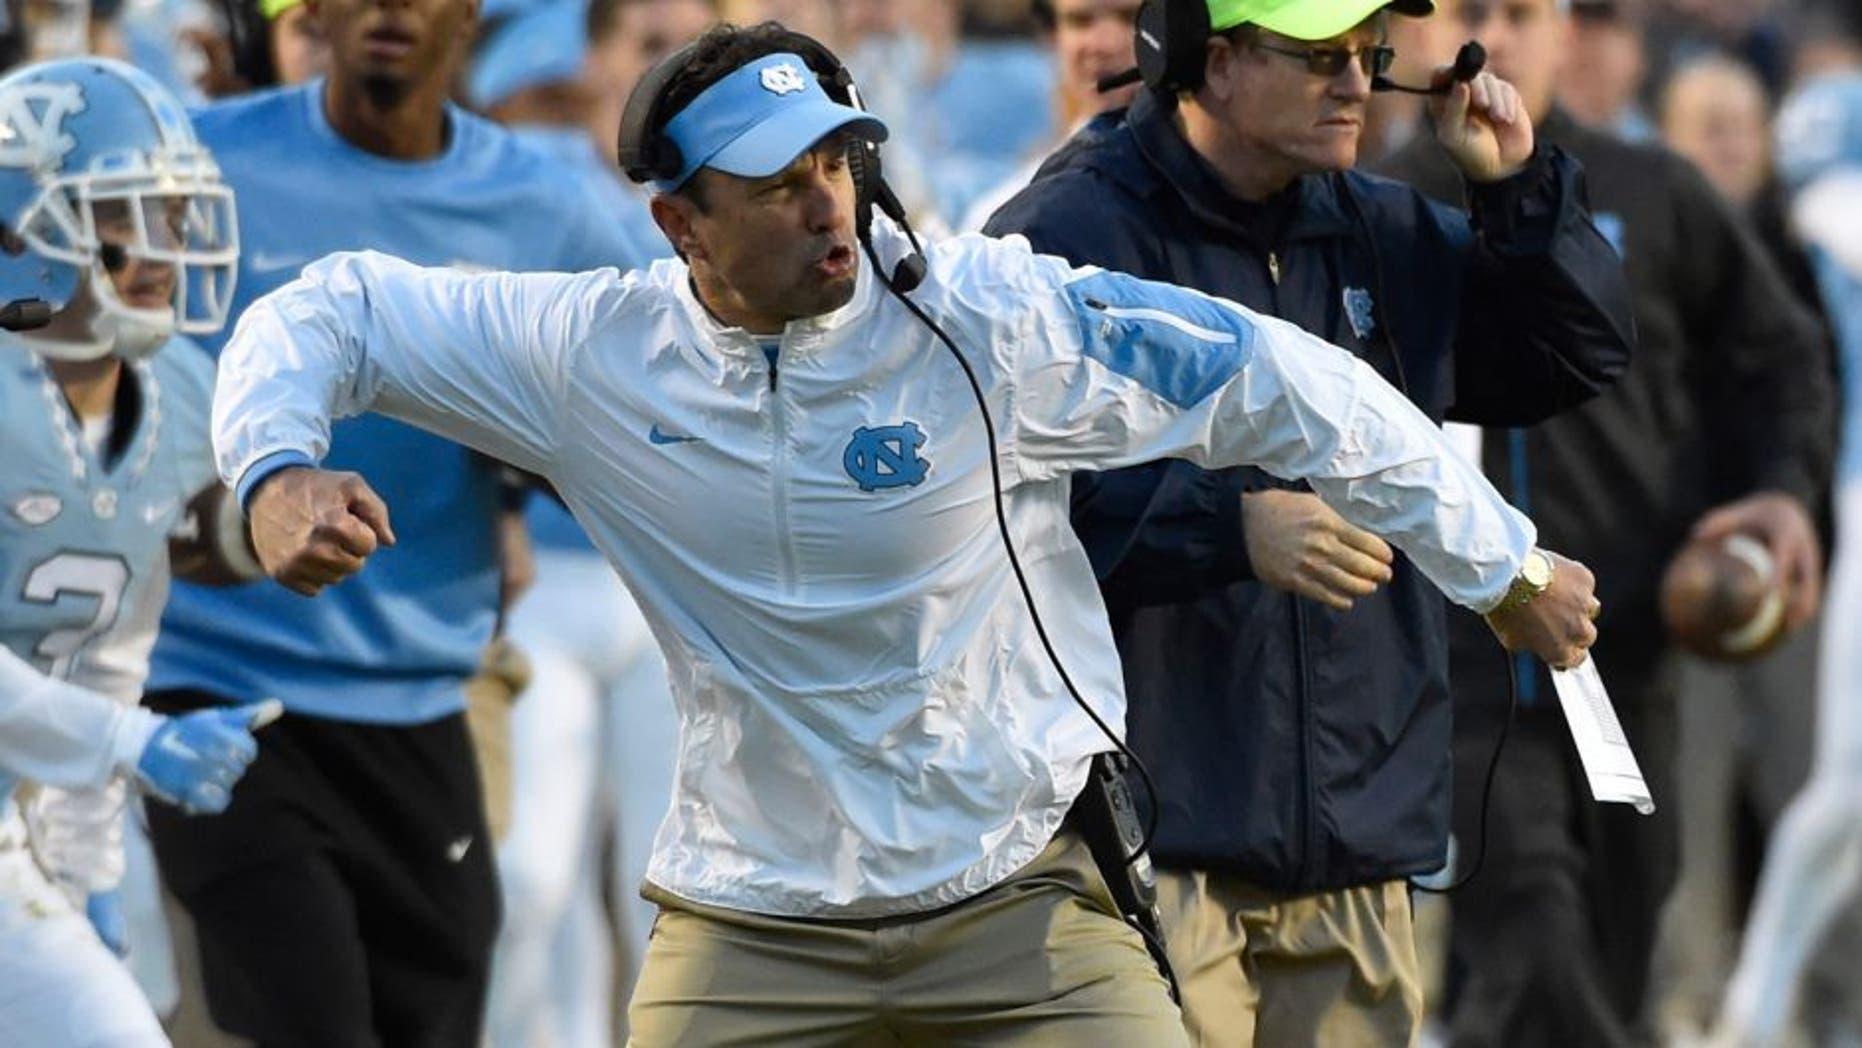 Nov 14, 2015; Chapel Hill, NC, USA; North Carolina Tar Heels head coach Larry Fedora reacts in the second quarter at Kenan Memorial Stadium. Mandatory Credit: Bob Donnan-USA TODAY Sports